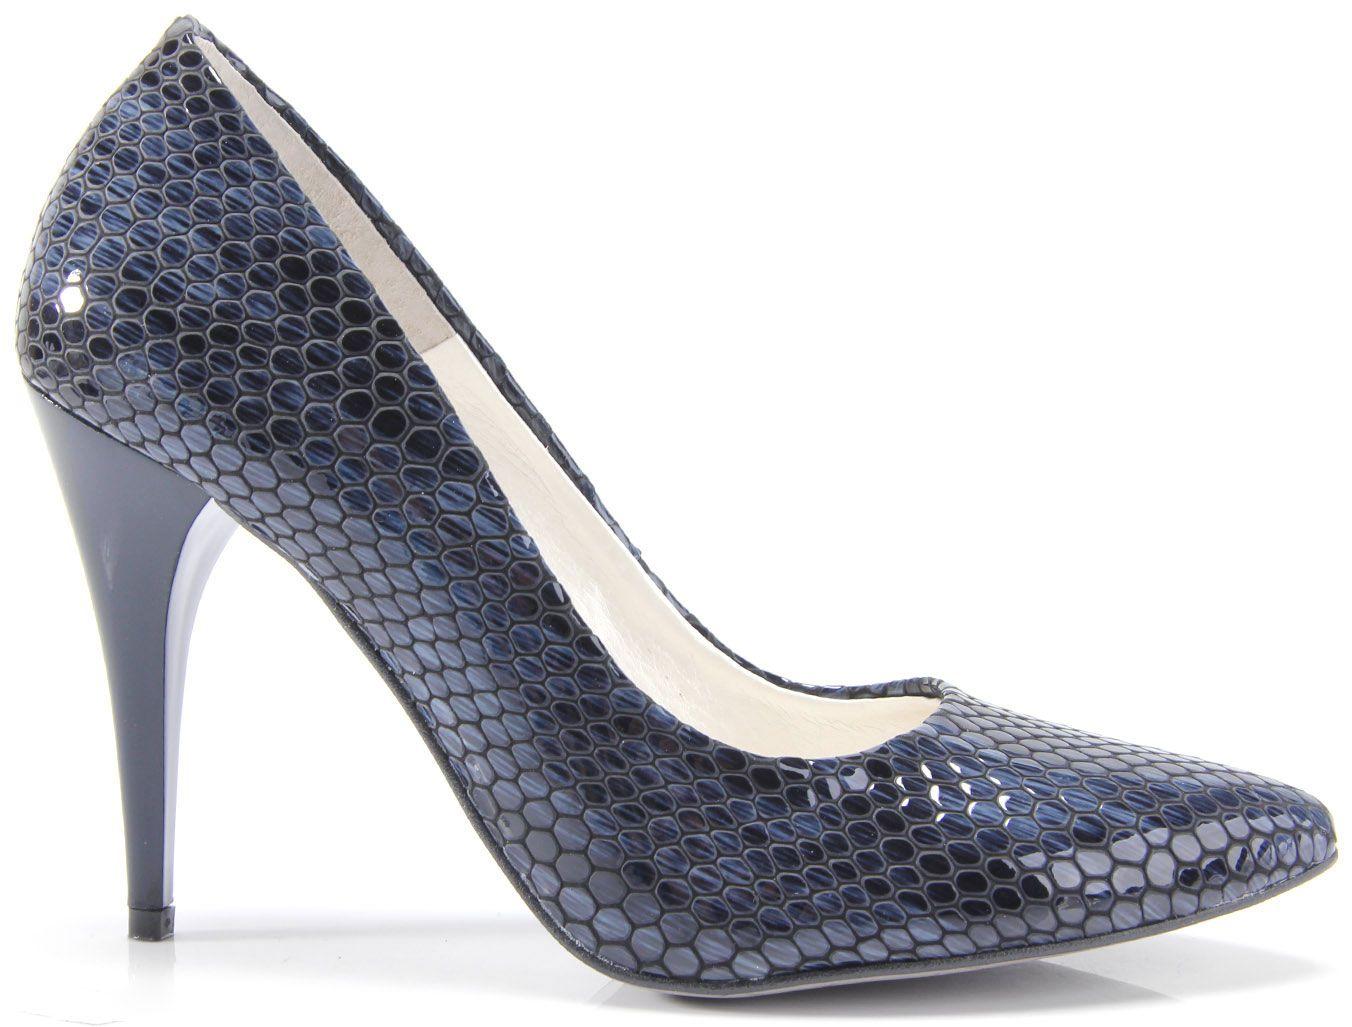 Czolenka Nescior 29c Gra R37 Lupa1x Stiletto Heels Heels Stiletto